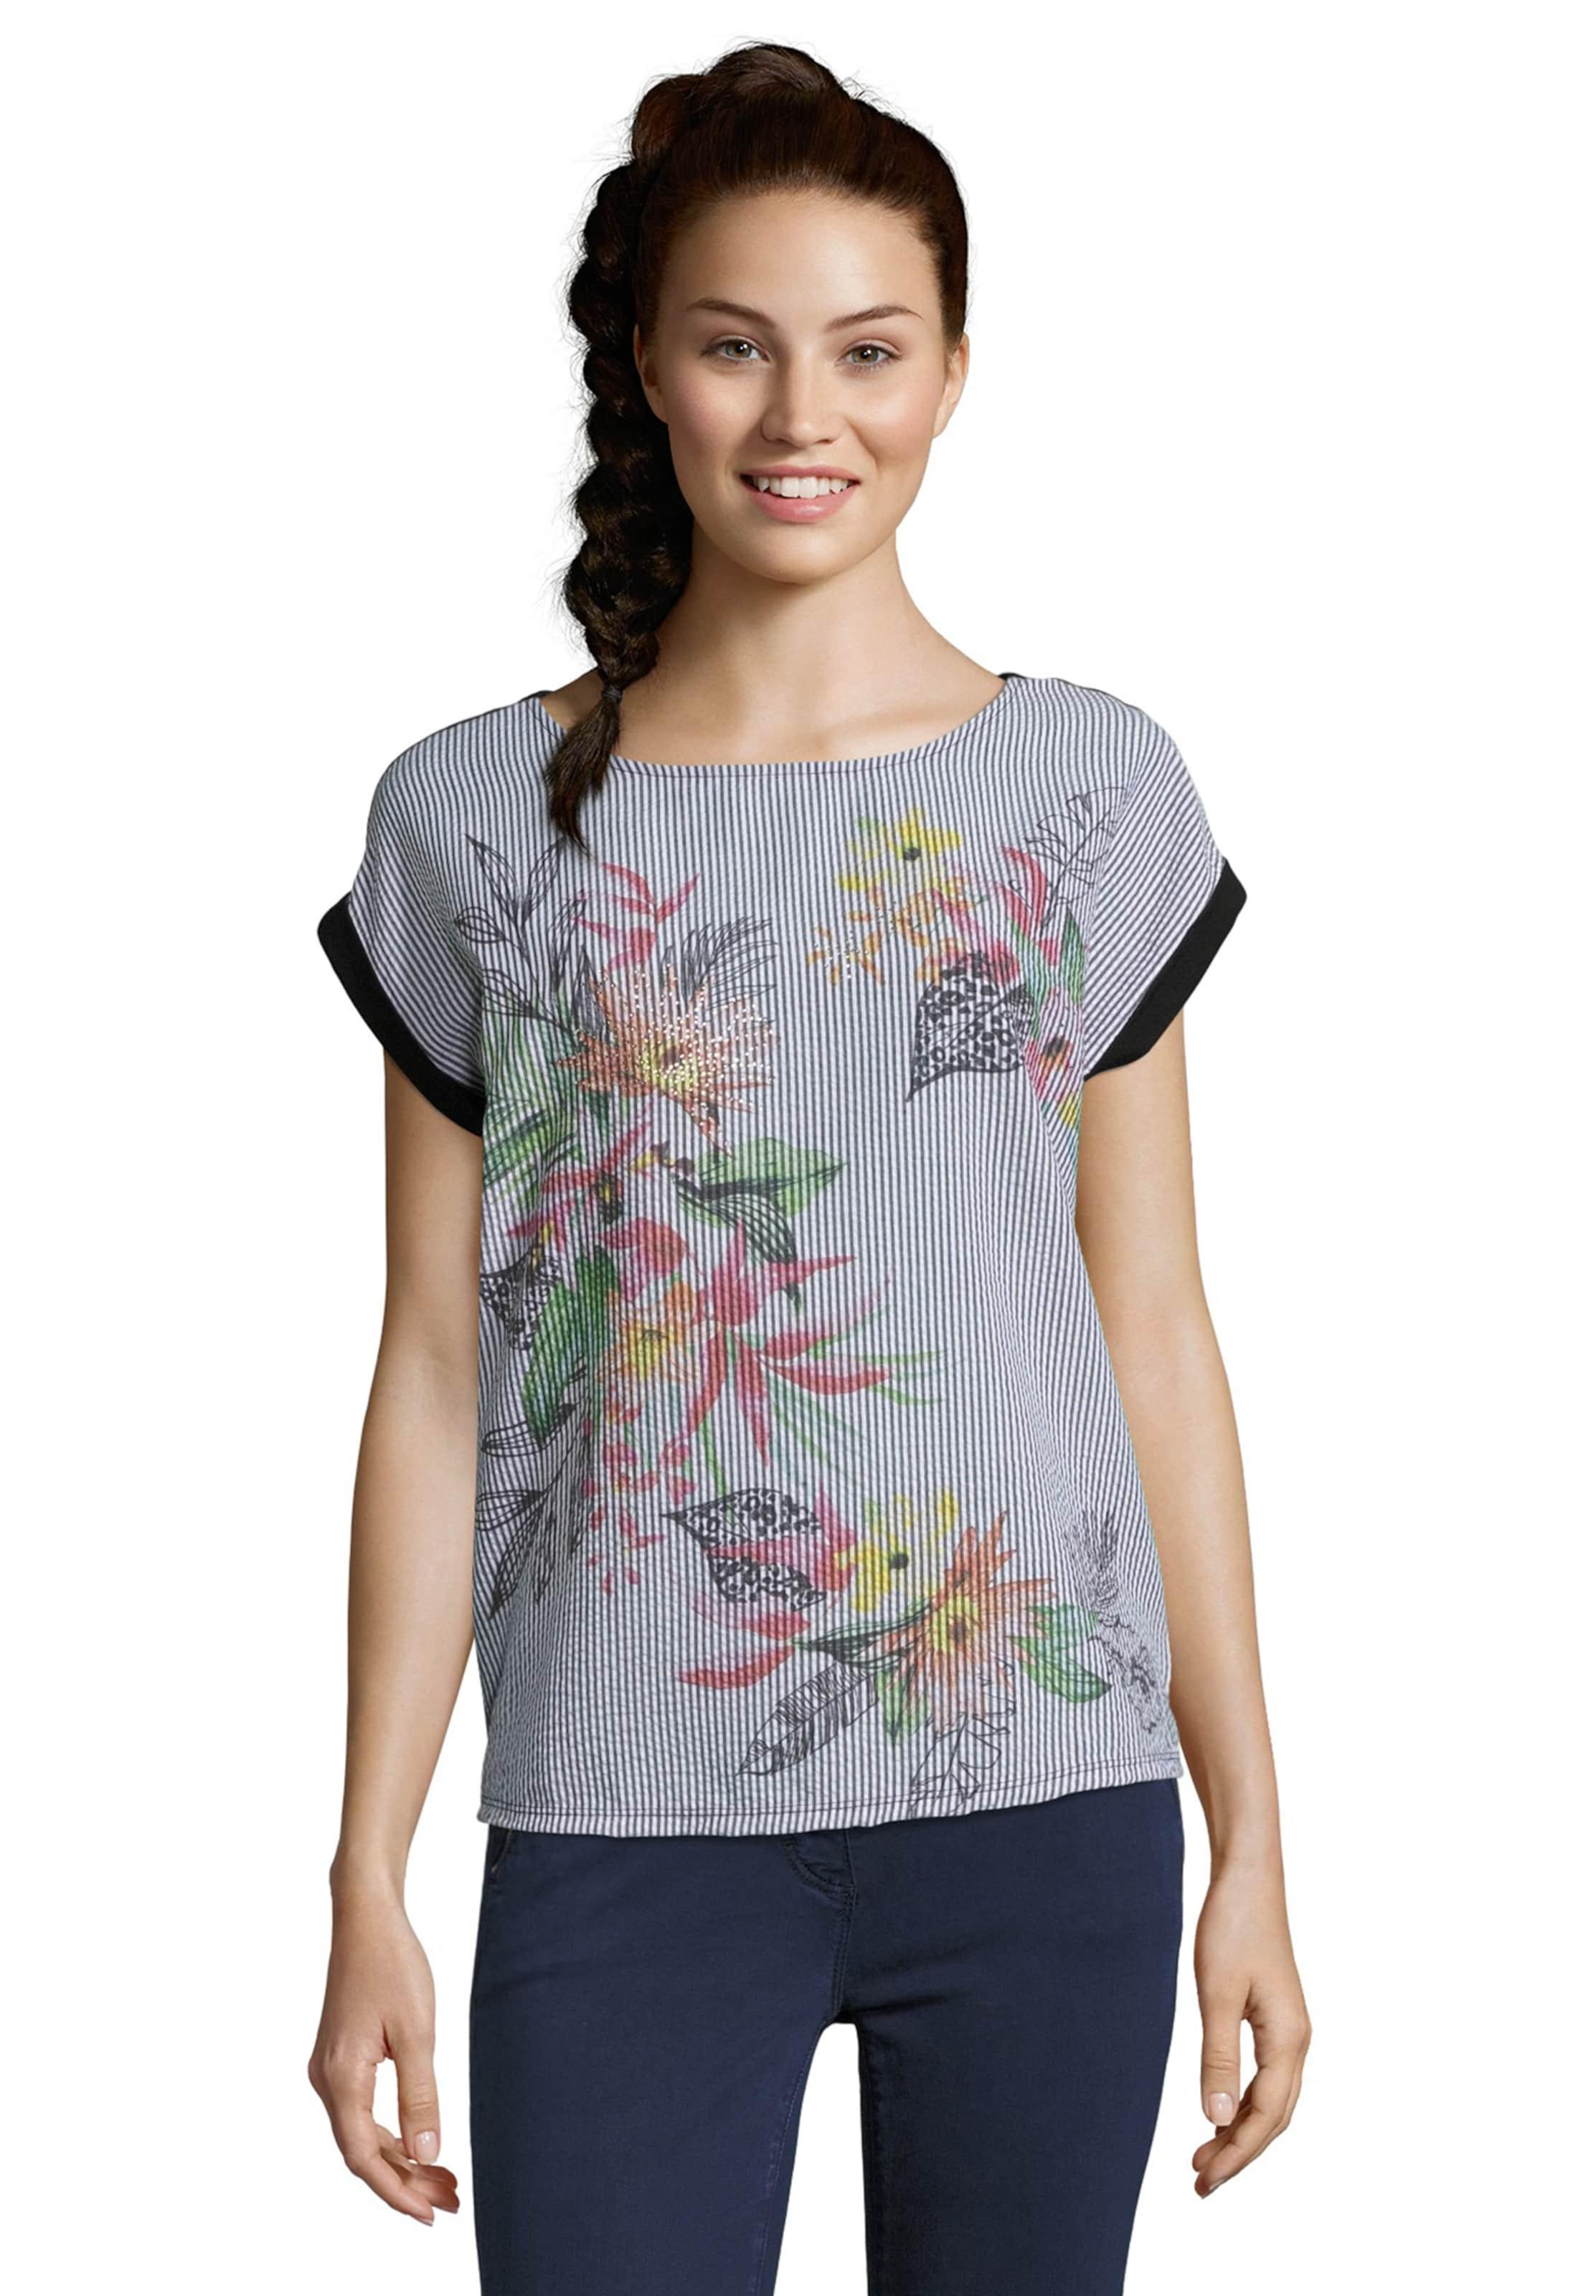 Betty In MischfarbenSchwarz Barclay Shirt TFcK1lJ